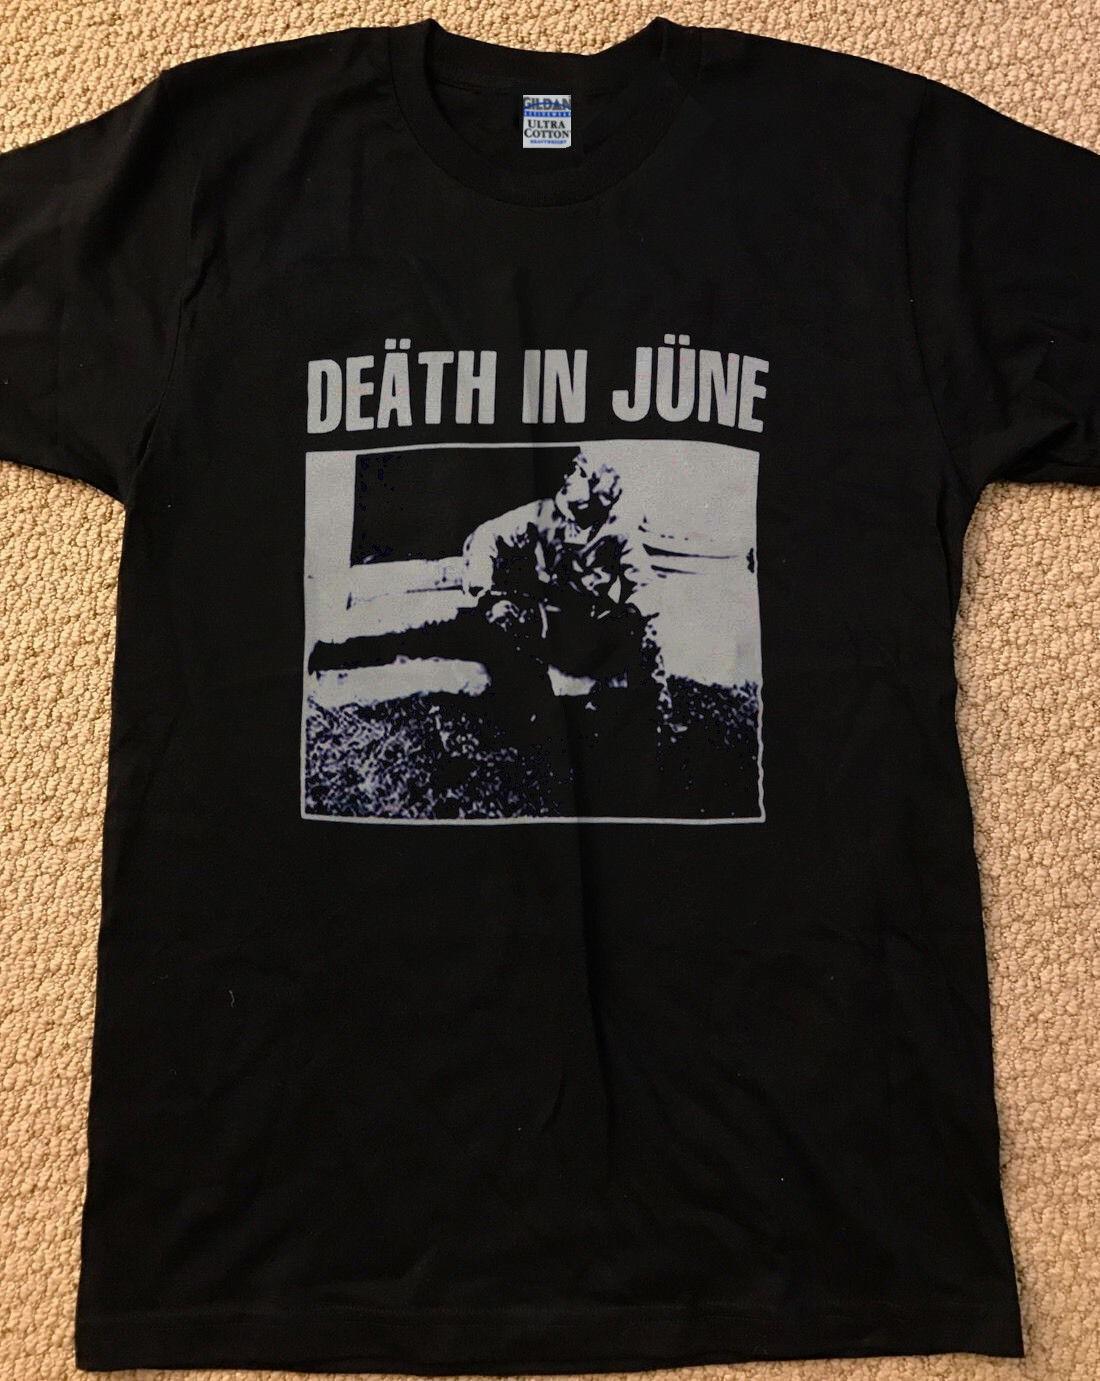 Death In June Shirt Vintage T Shirt Black Tee Shirt Neofolk Reprint Size S Xxl Mens T Shirt 011730